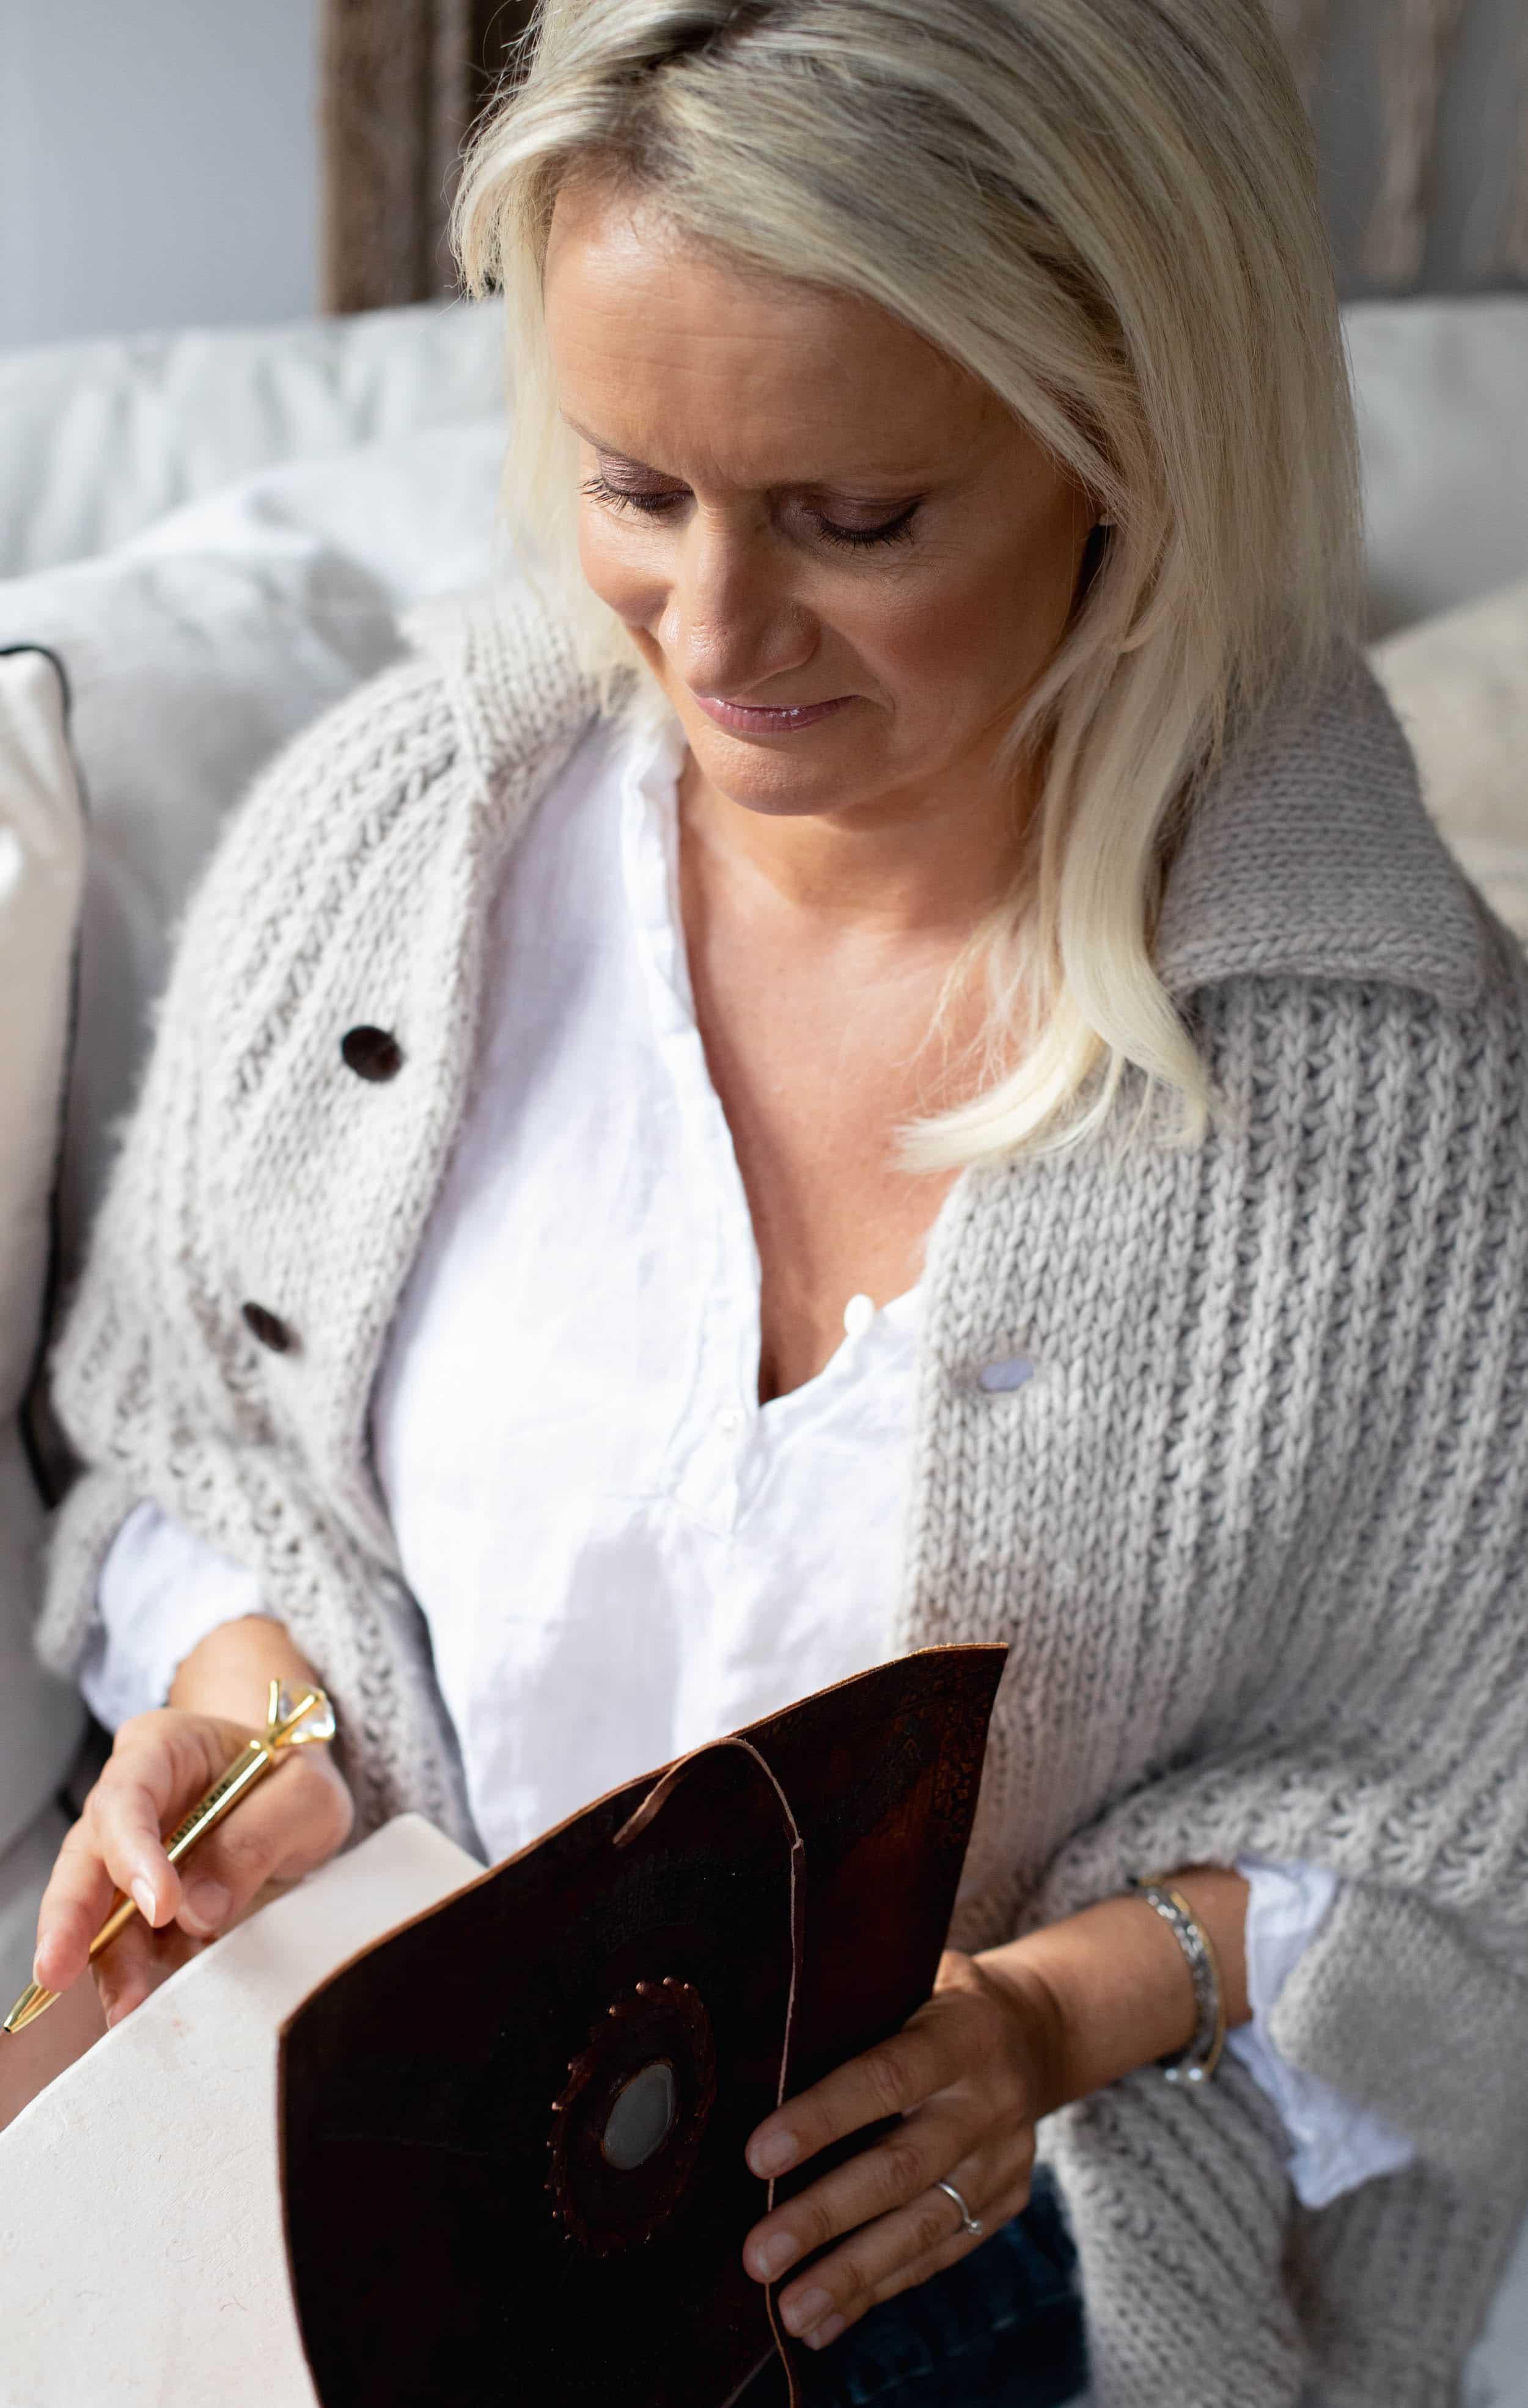 familieterapi Fyn - familieterapi Odense - familieterapi Svendborg - familieterapi Tranekær